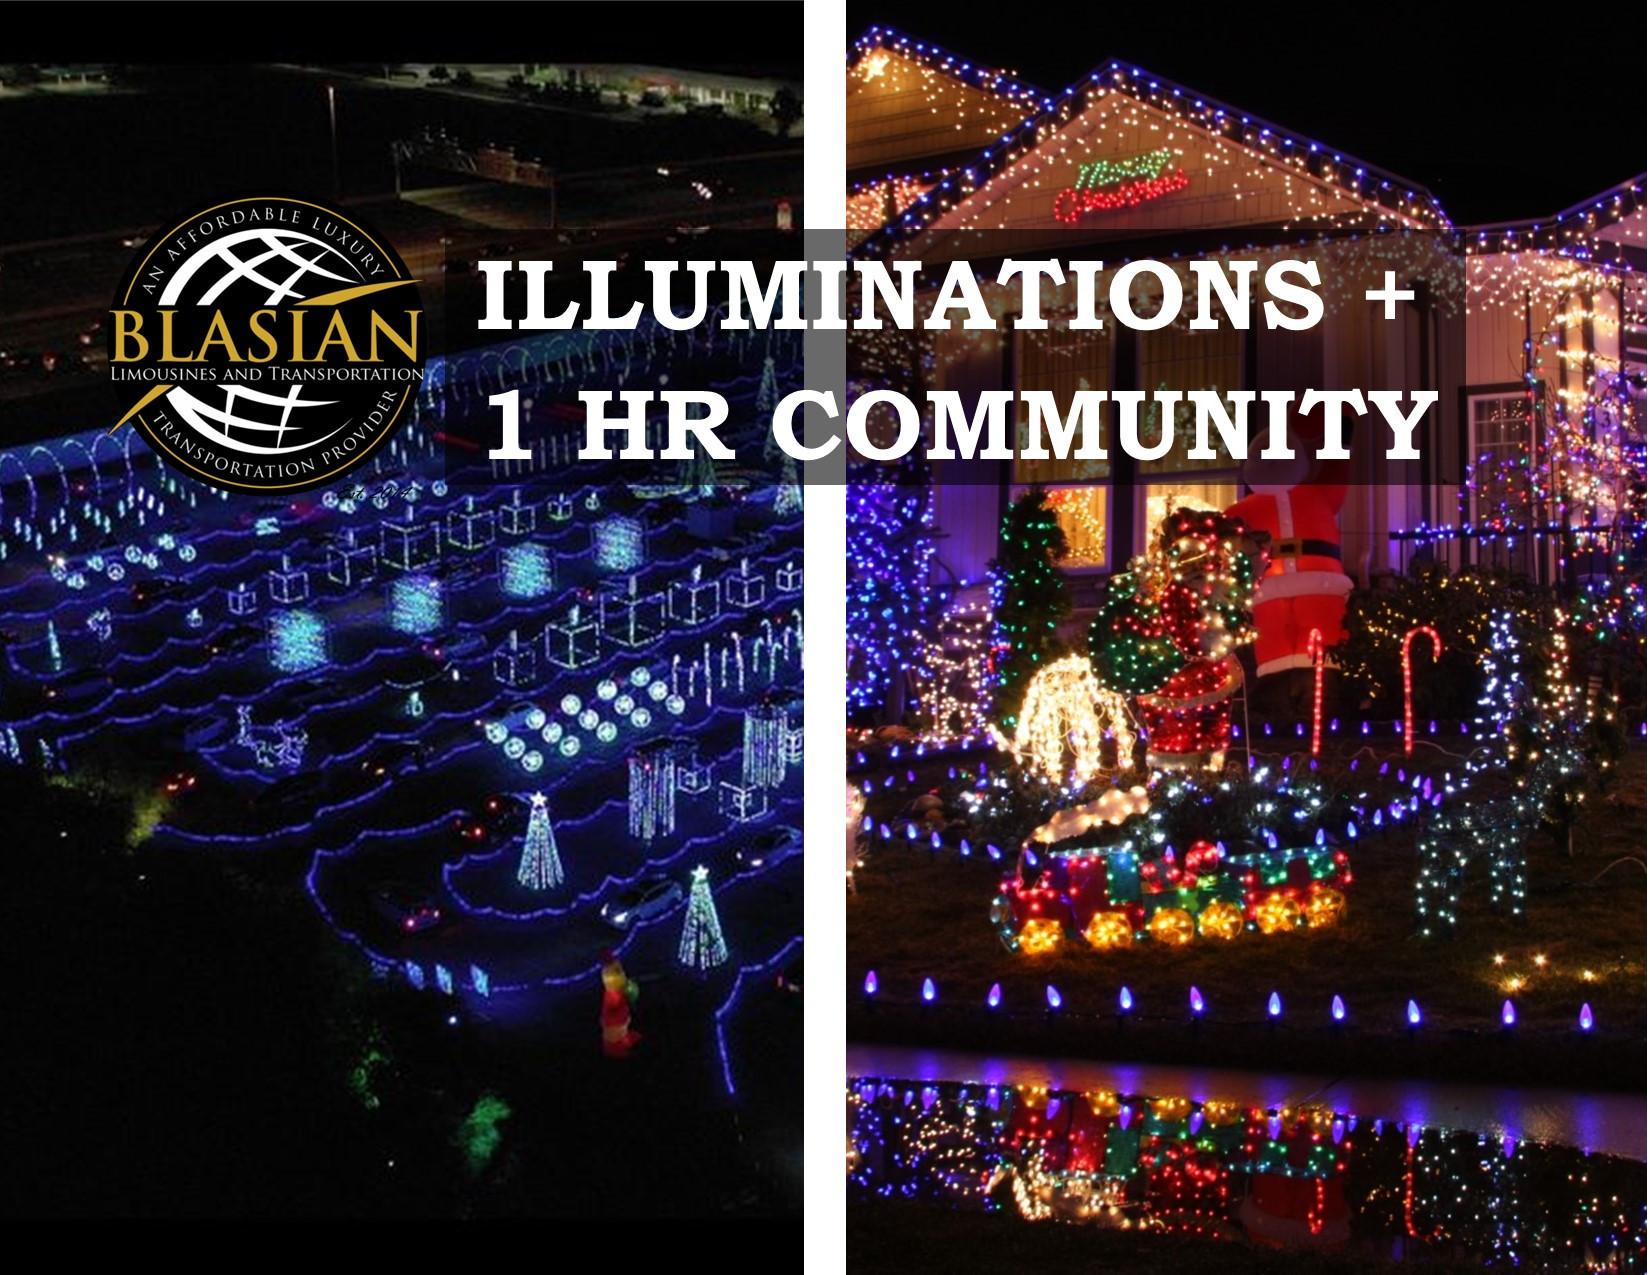 ILLUMINATIONS & 1HR COMMUNITY LIGHT TOUR